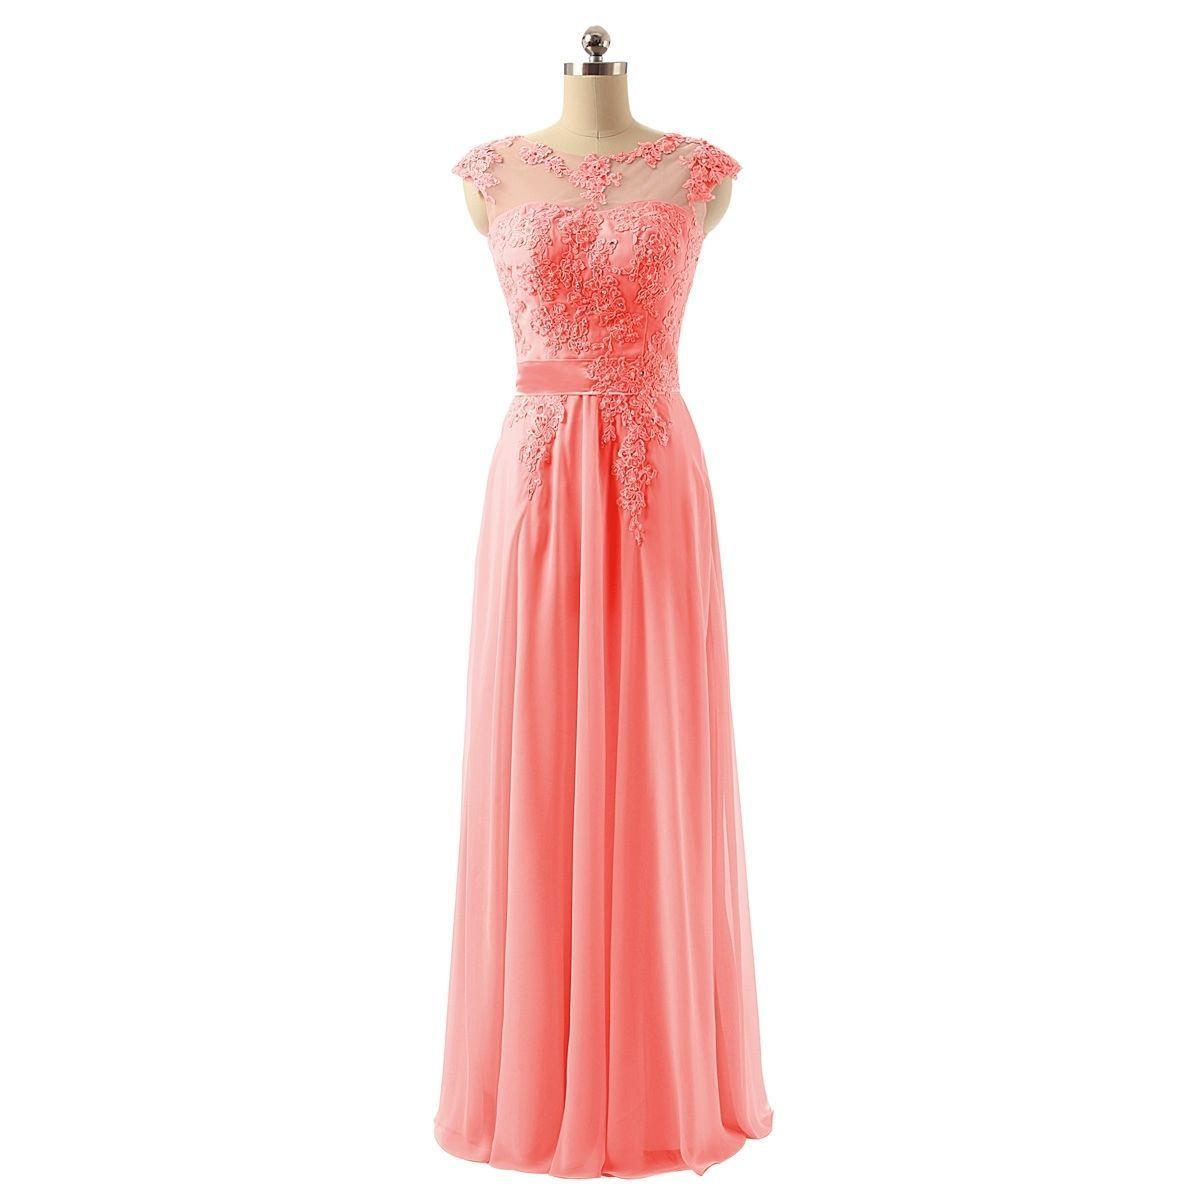 Lace Applique Chiffon Sheer Long Evening Dresses Bridesmaid Prom ...